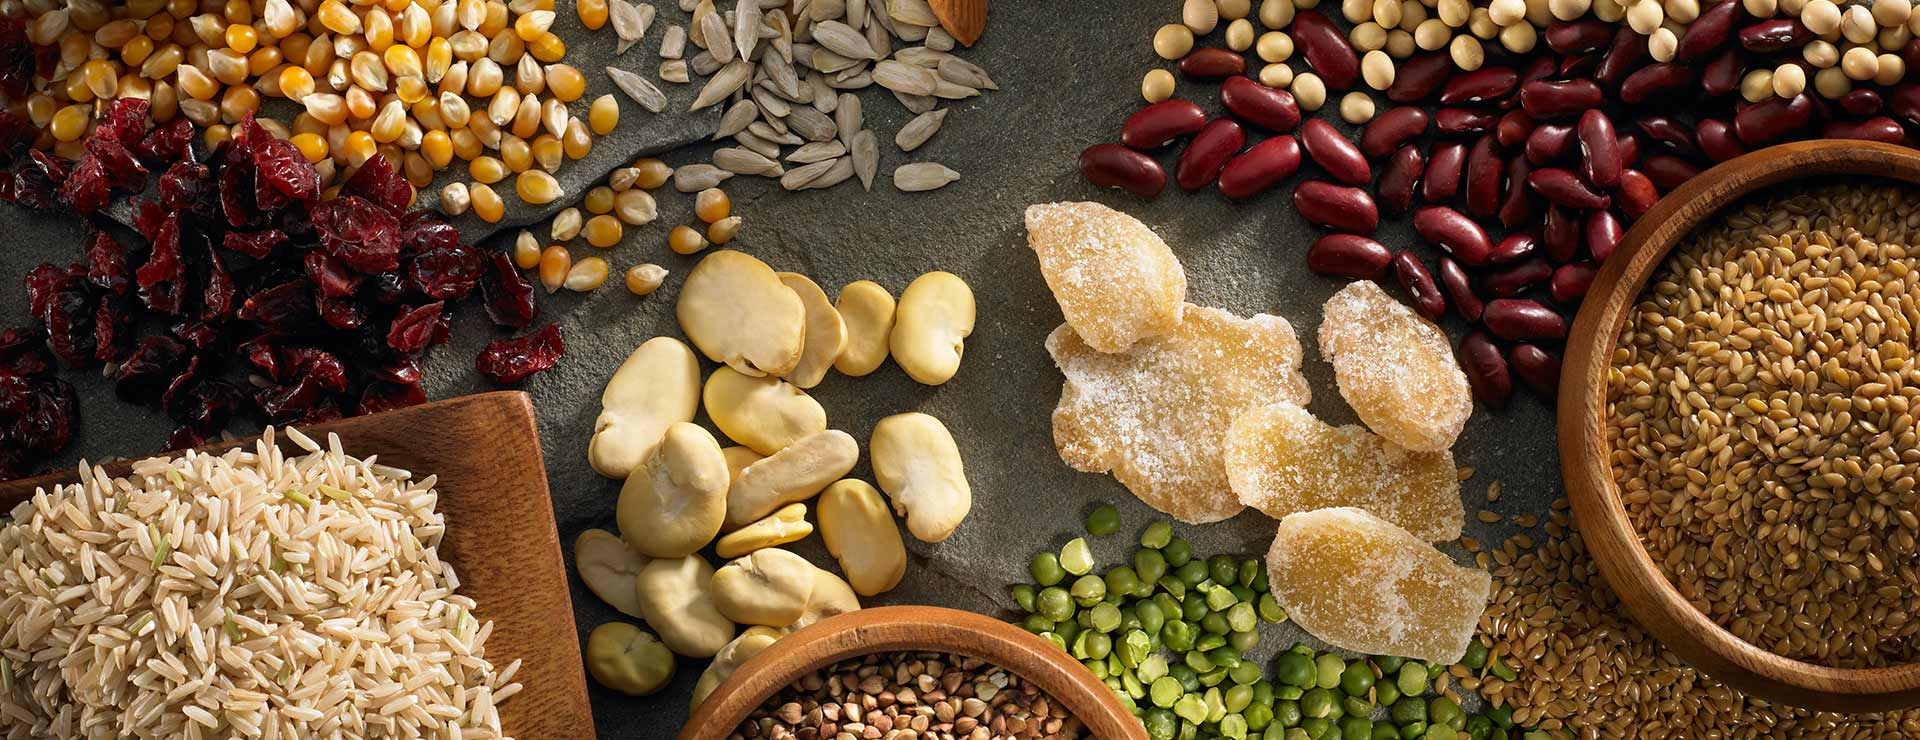 Dietary Changes for Celiac Disease | Johns Hopkins Medicine